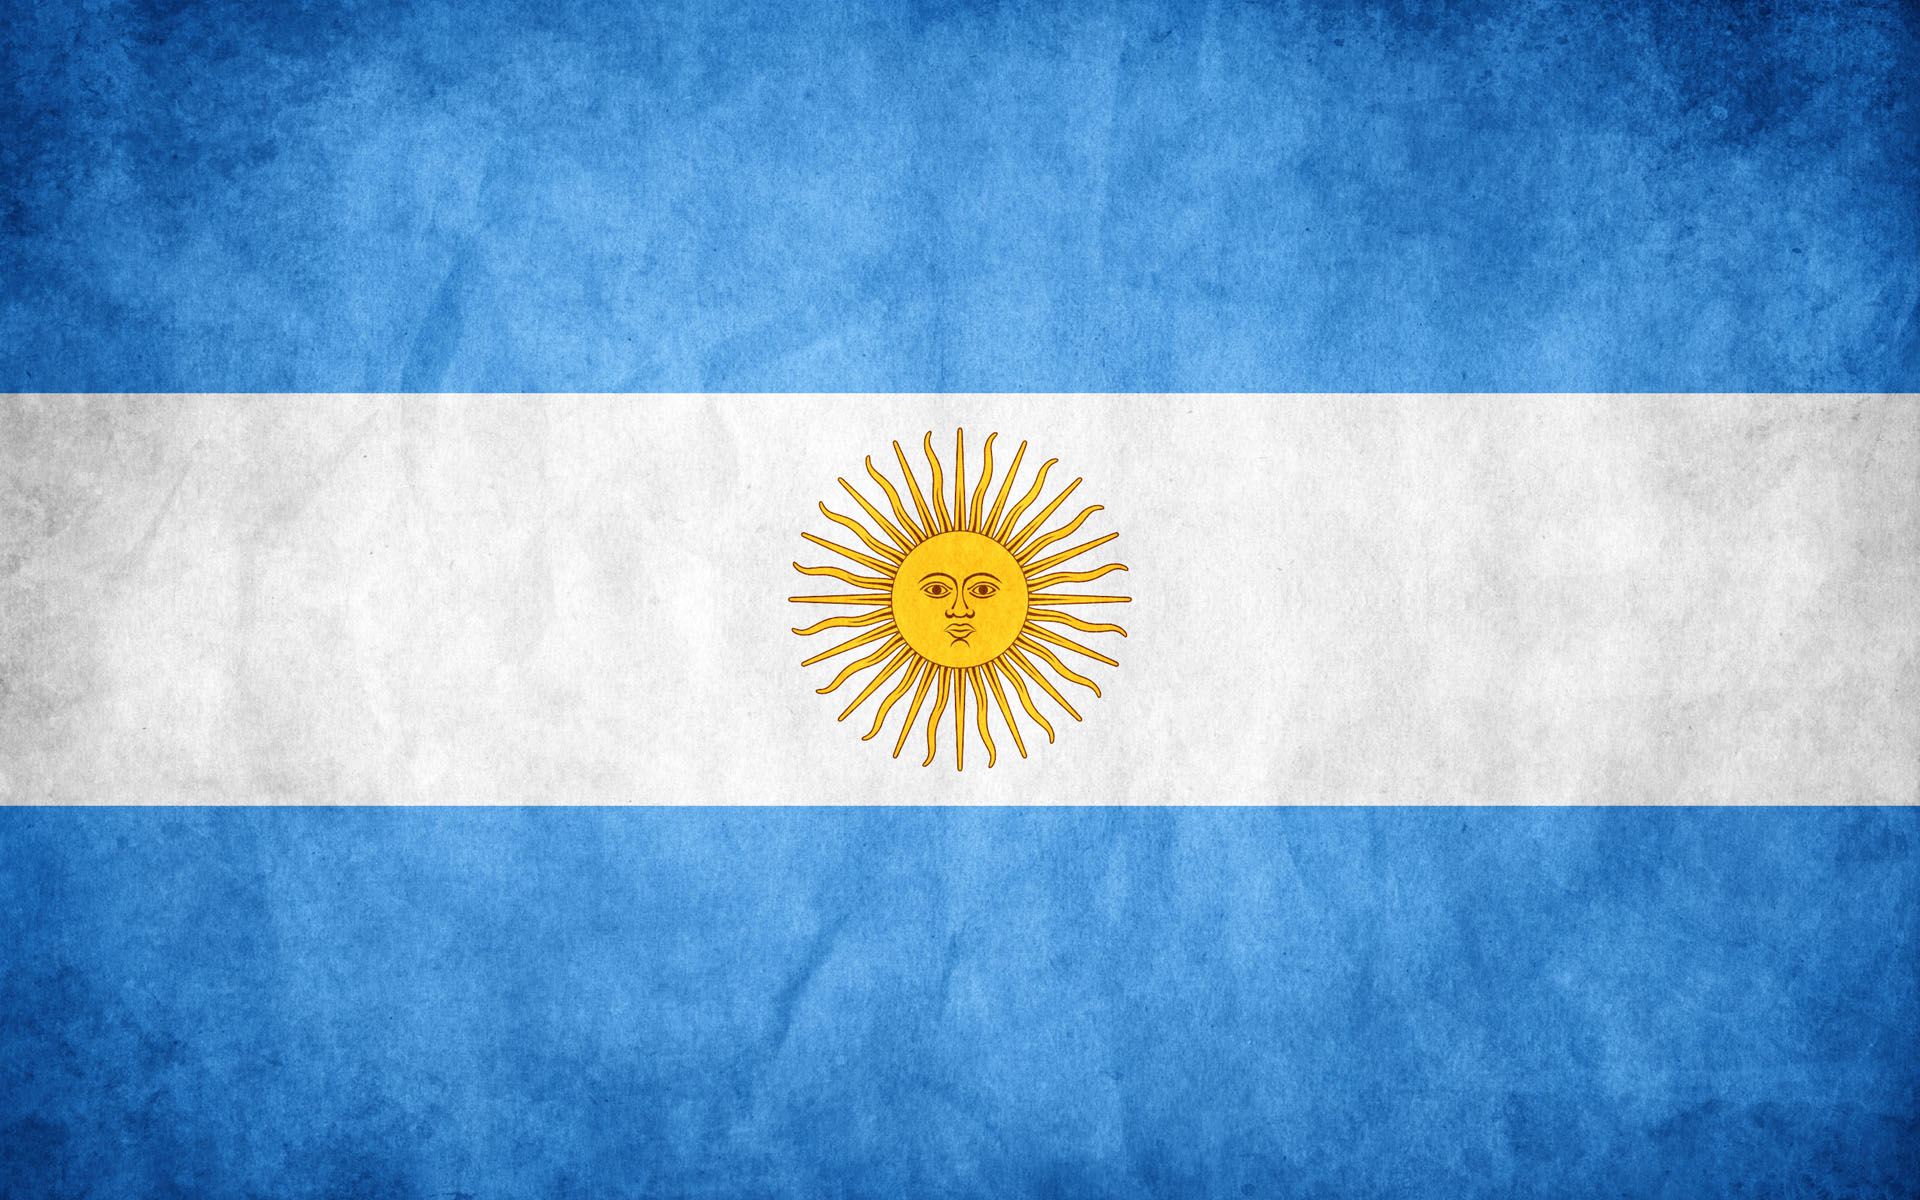 ArgentinaFlag.jpg (1920×1200)